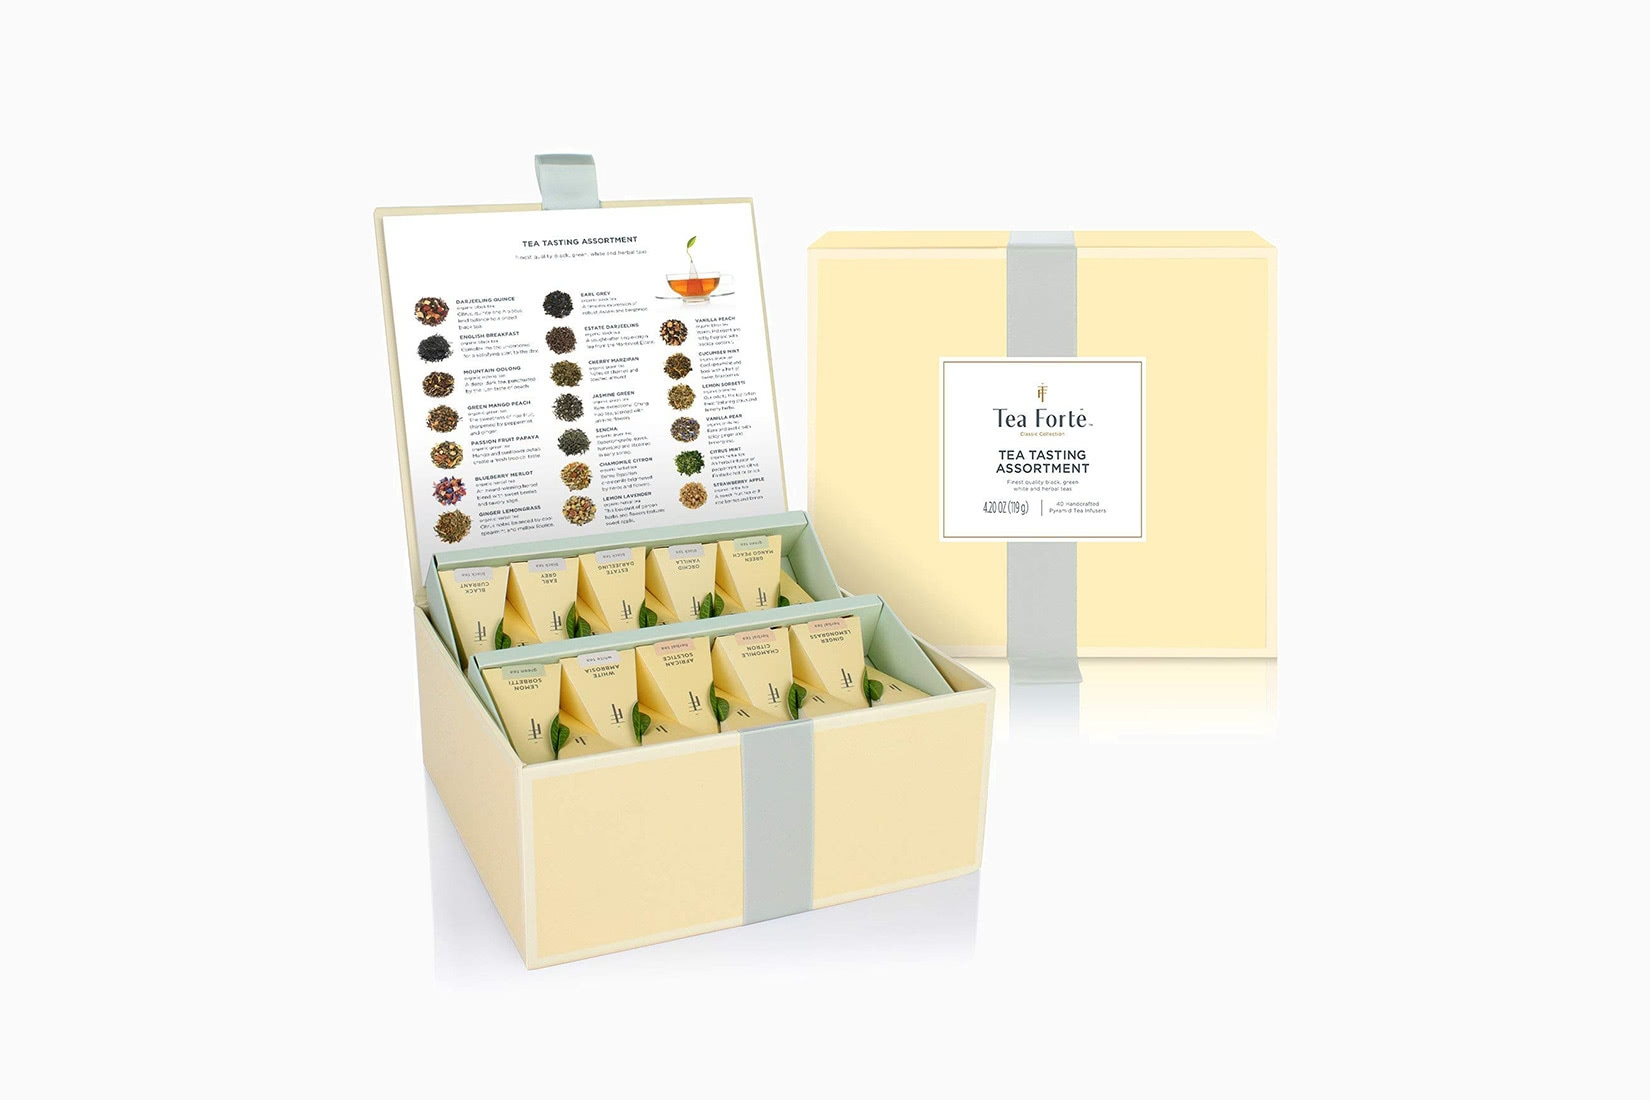 best tea brands forte organic assorted variety sampler - Luxe Digital